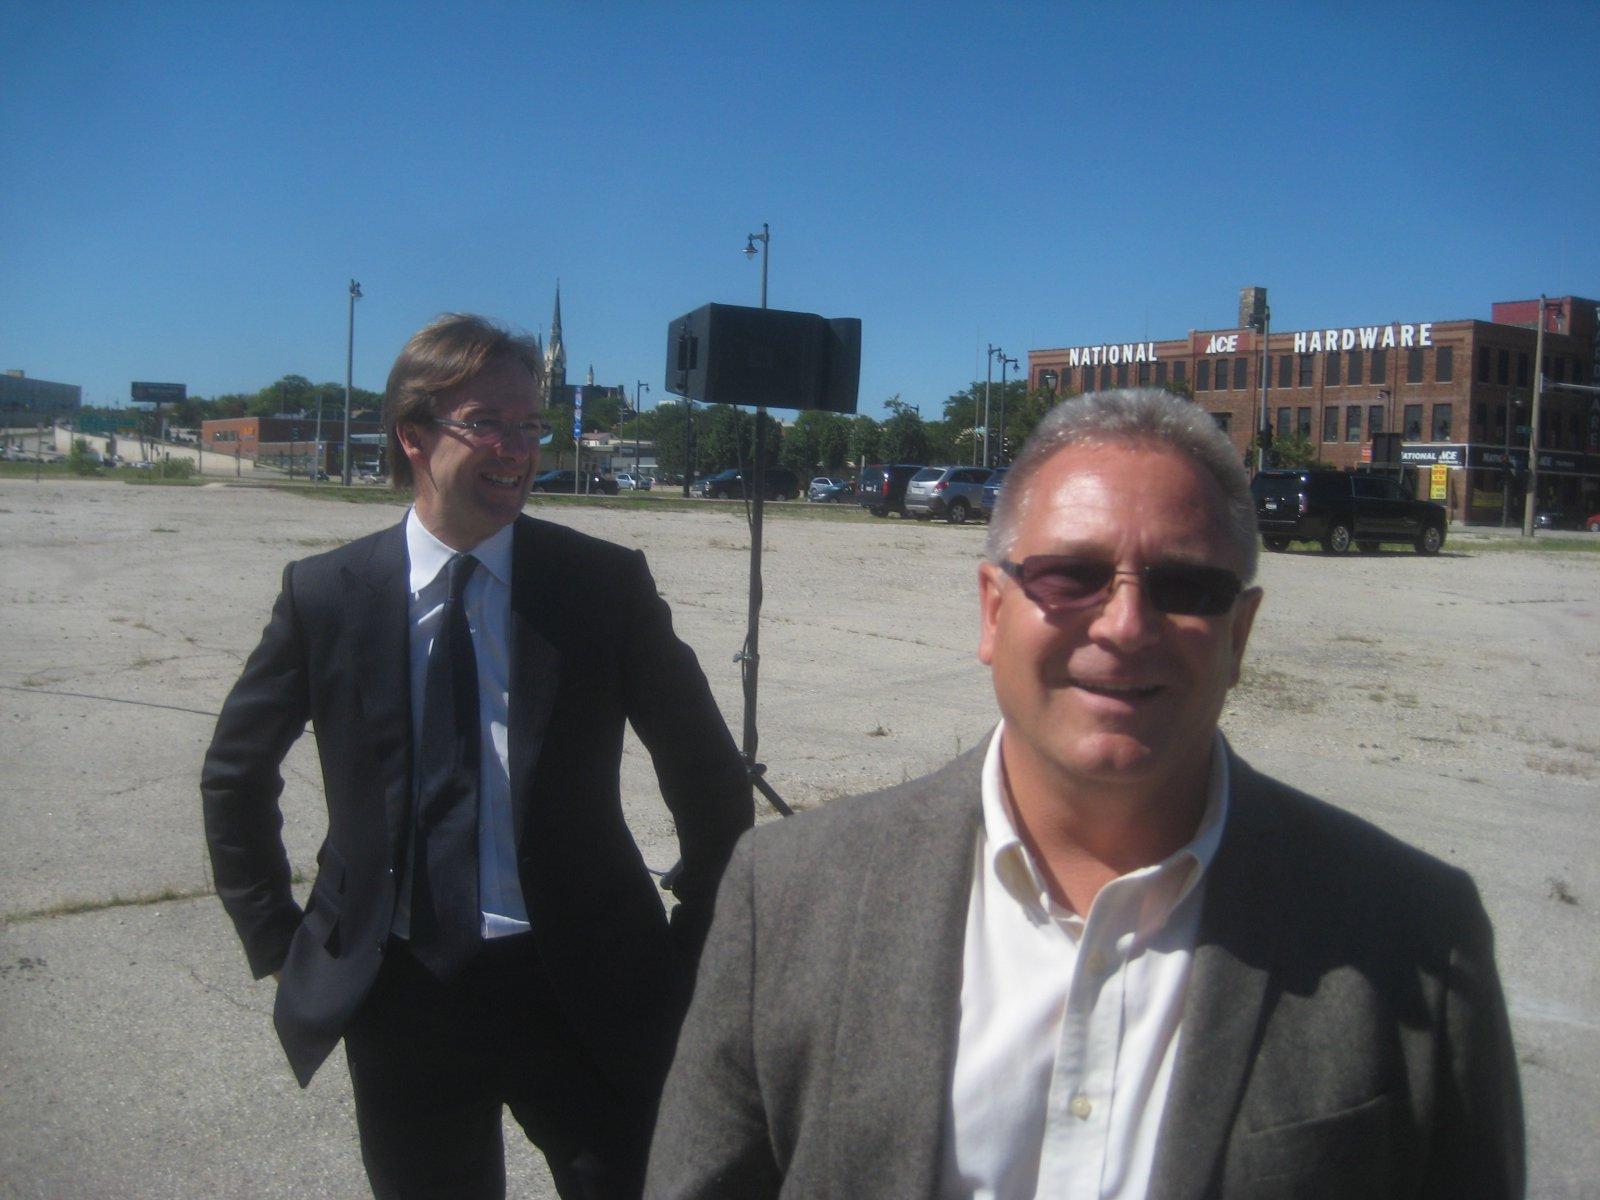 Chris Abele and Dan Bukiewicz